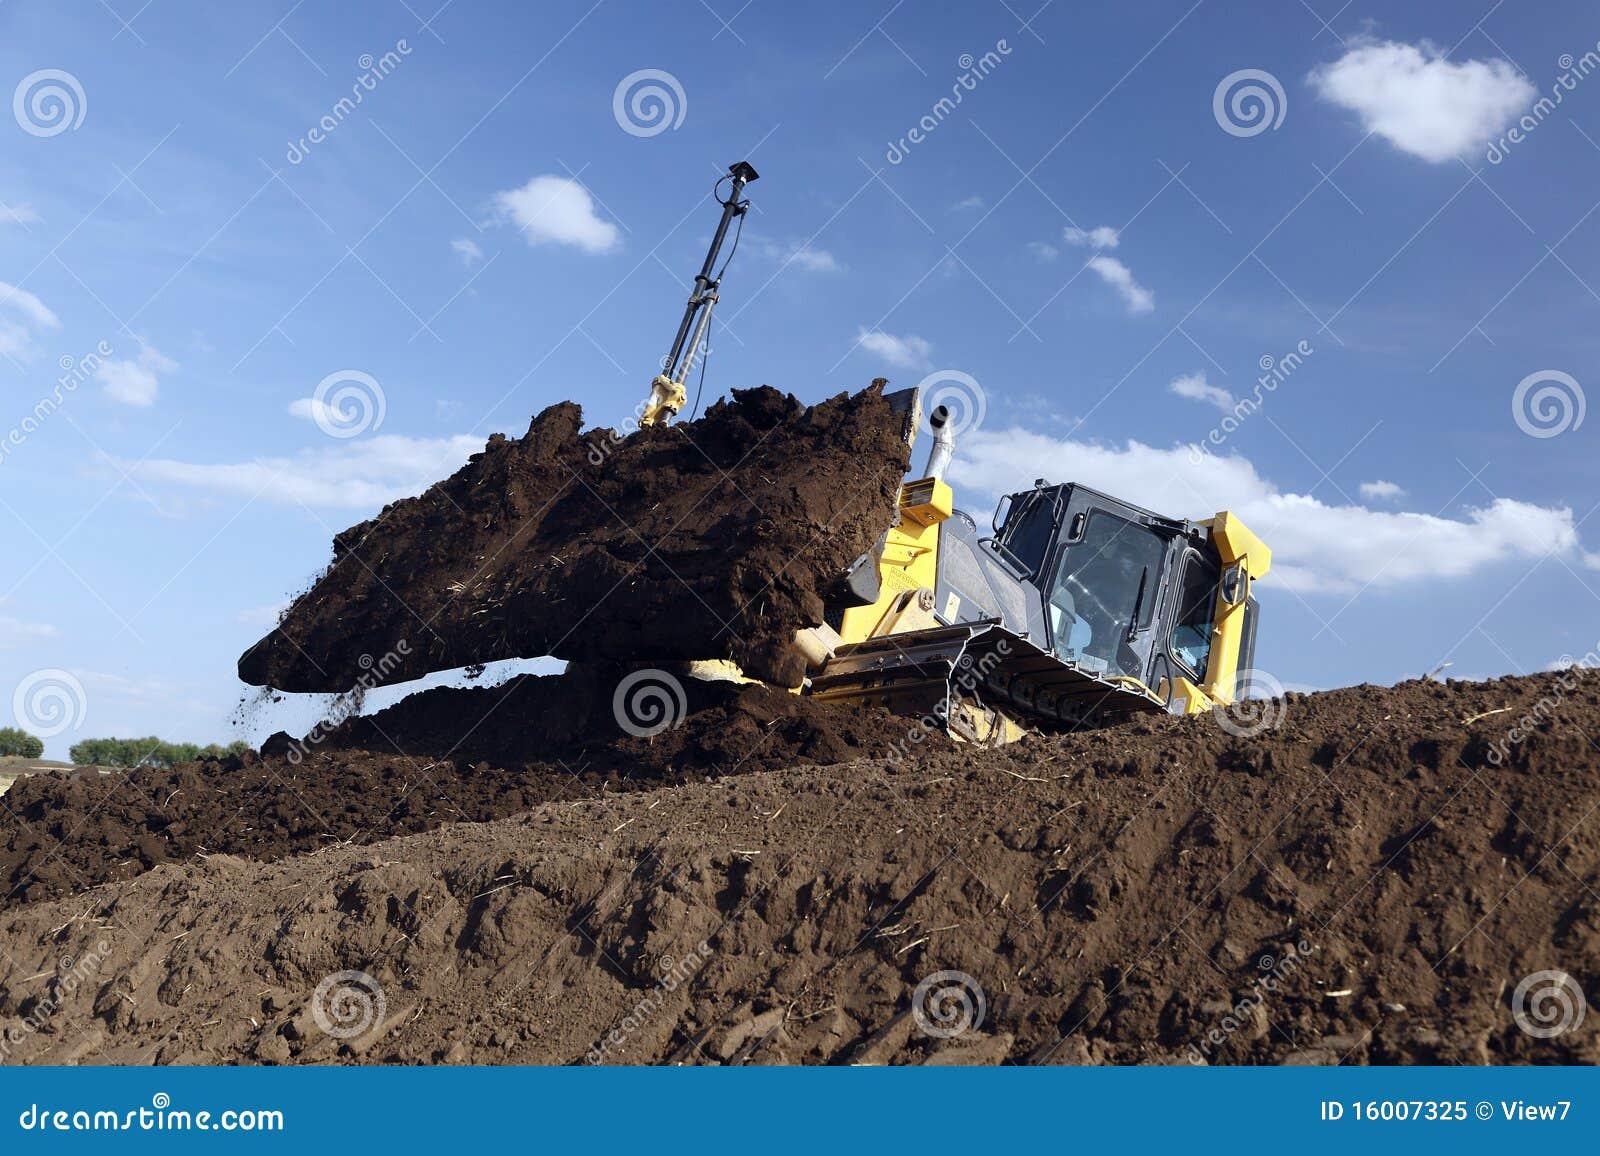 Bulldozer moving dirt